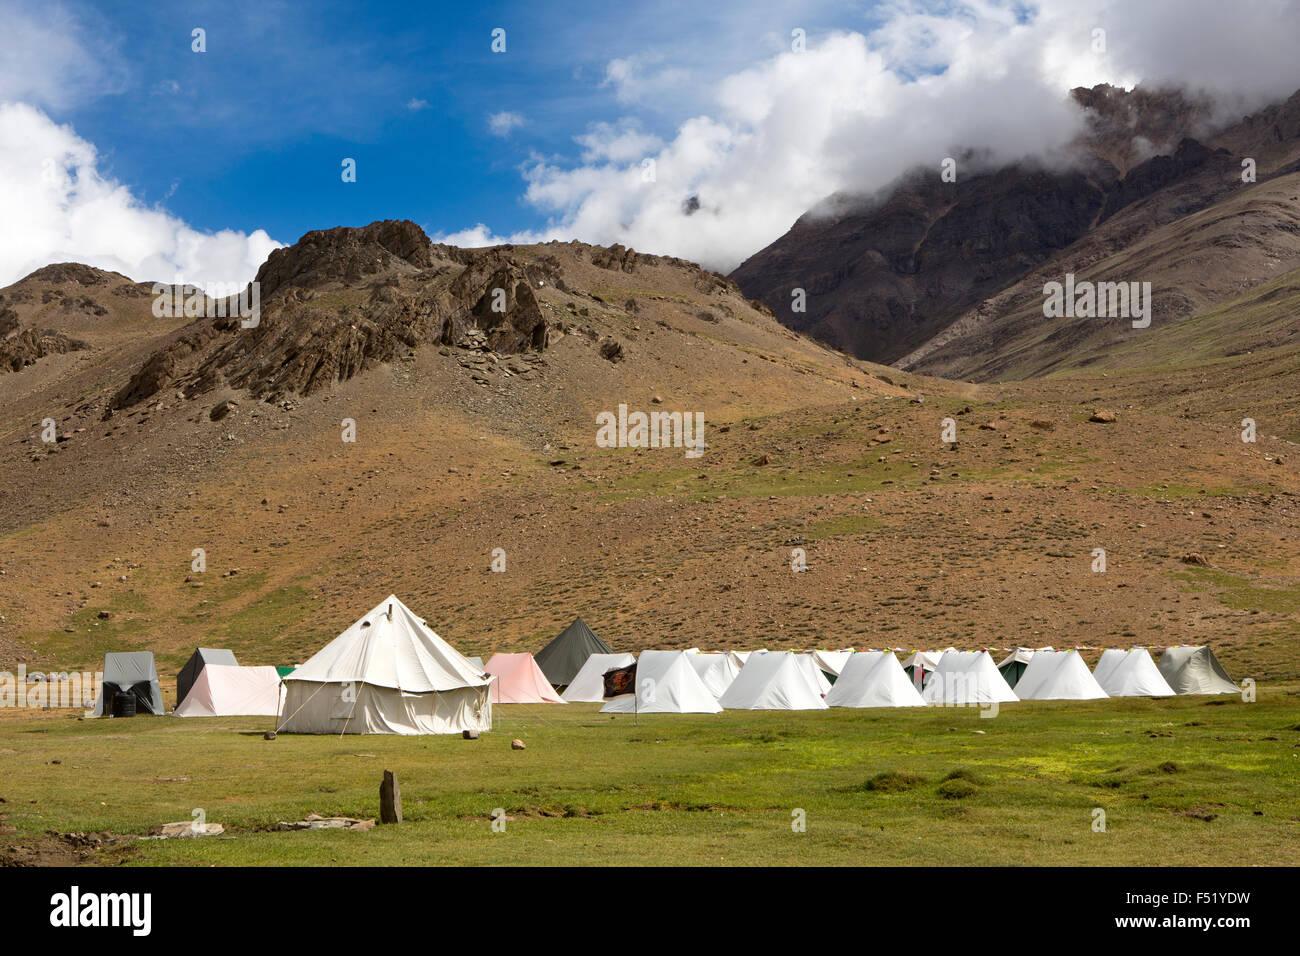 India, Himachal Pradesh, Spiti, Chandra Taal, Full Moon Lake camp site, seasonal tourist accommodation tents - Stock Image